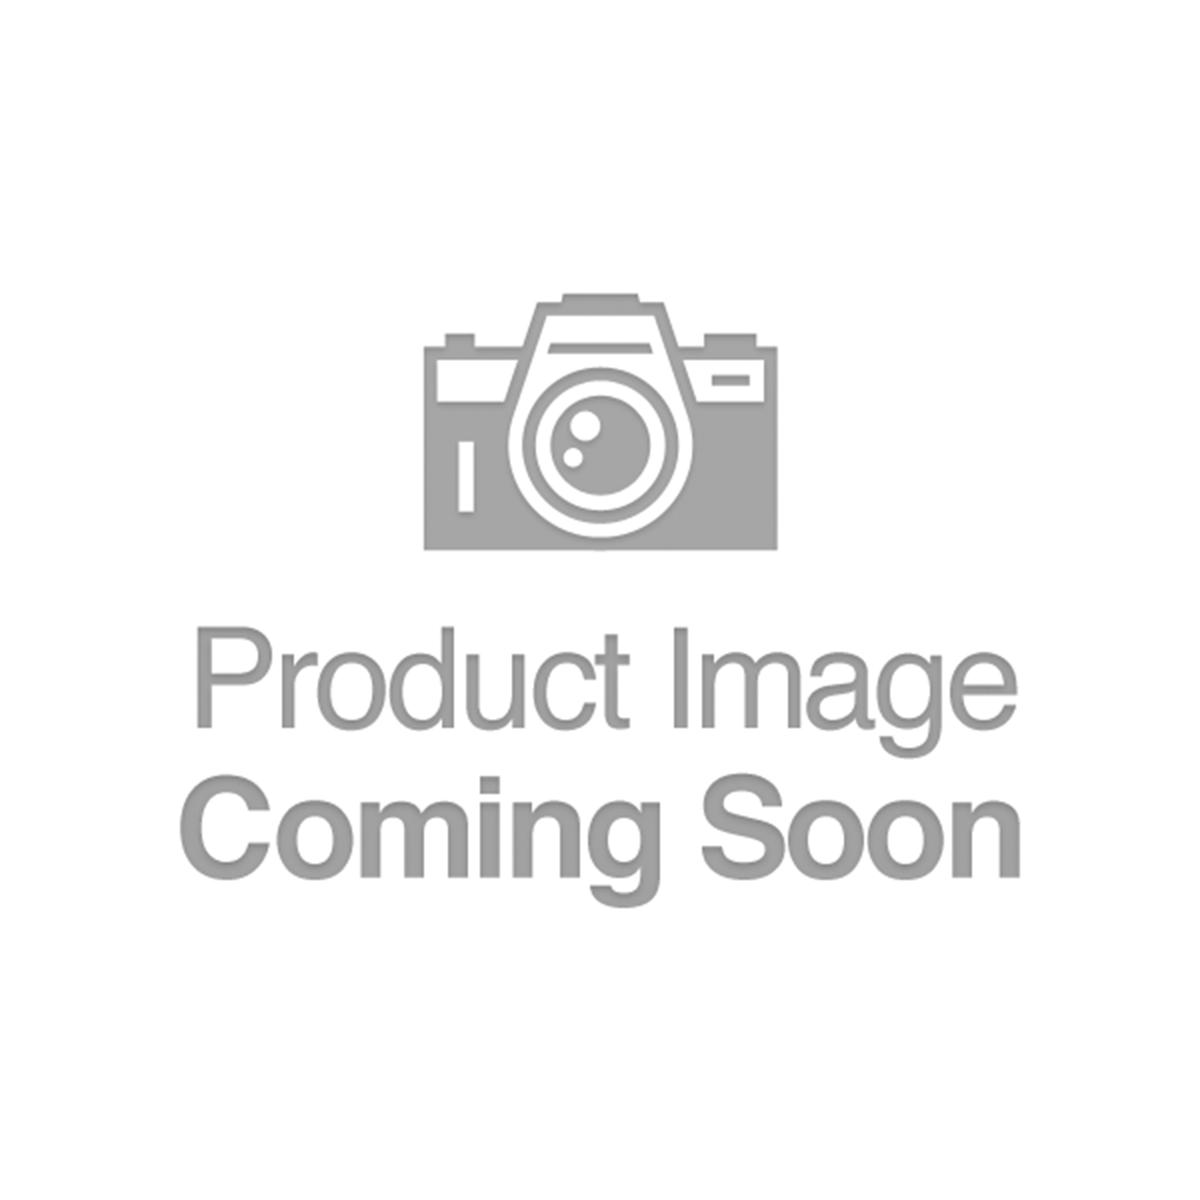 FR. 2402 $20 1928 Gold Certificate PMG 65 EPQ